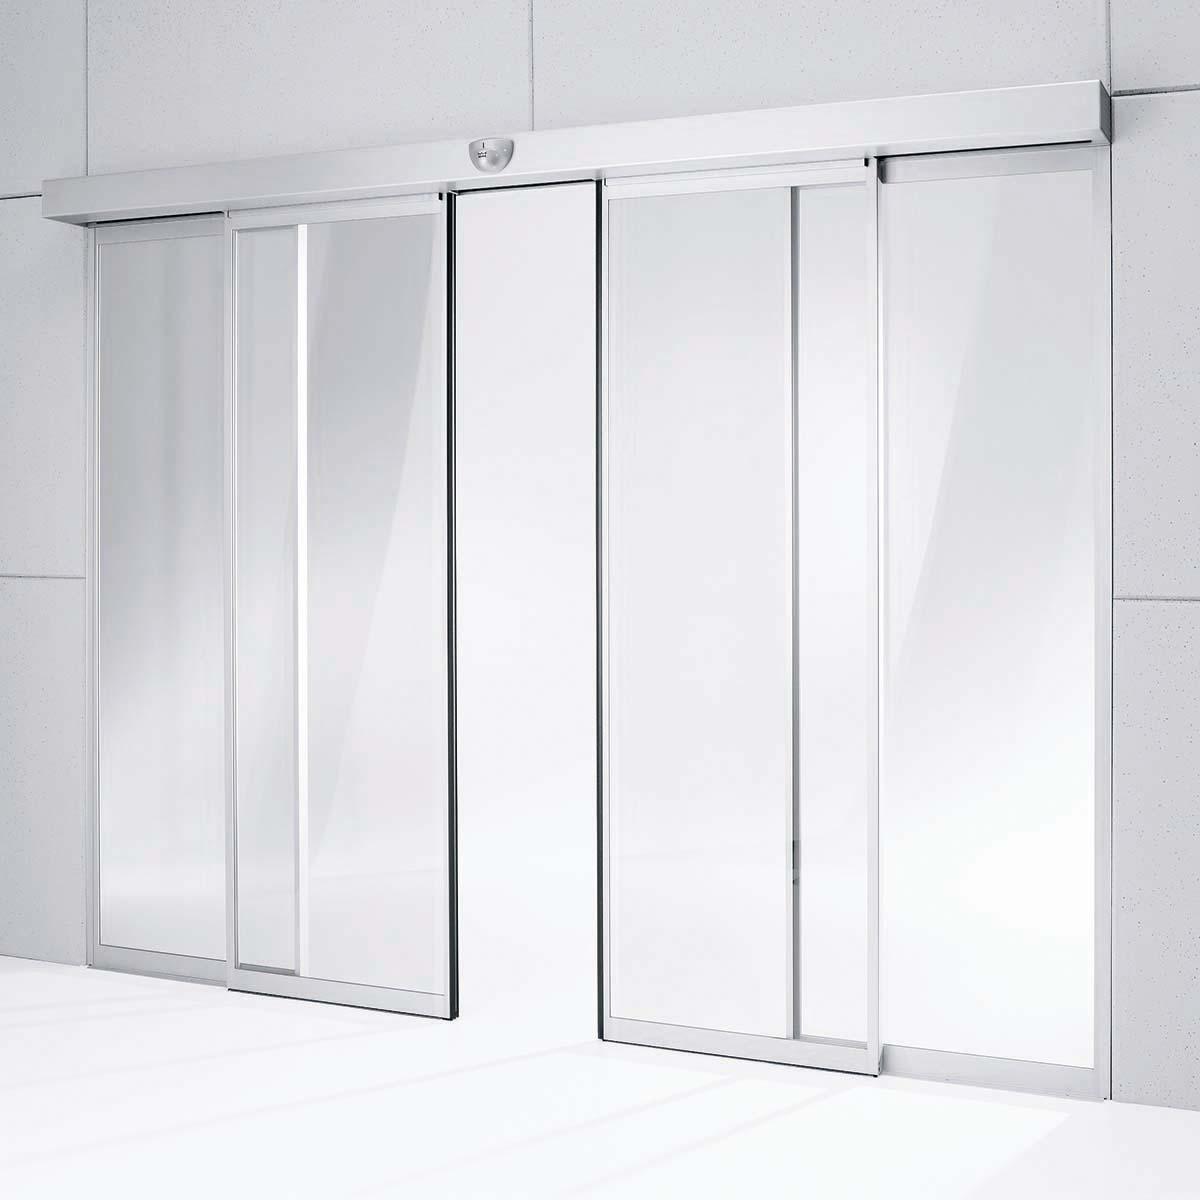 Automatic Sliding Glass Doors Revit1200 X 1200